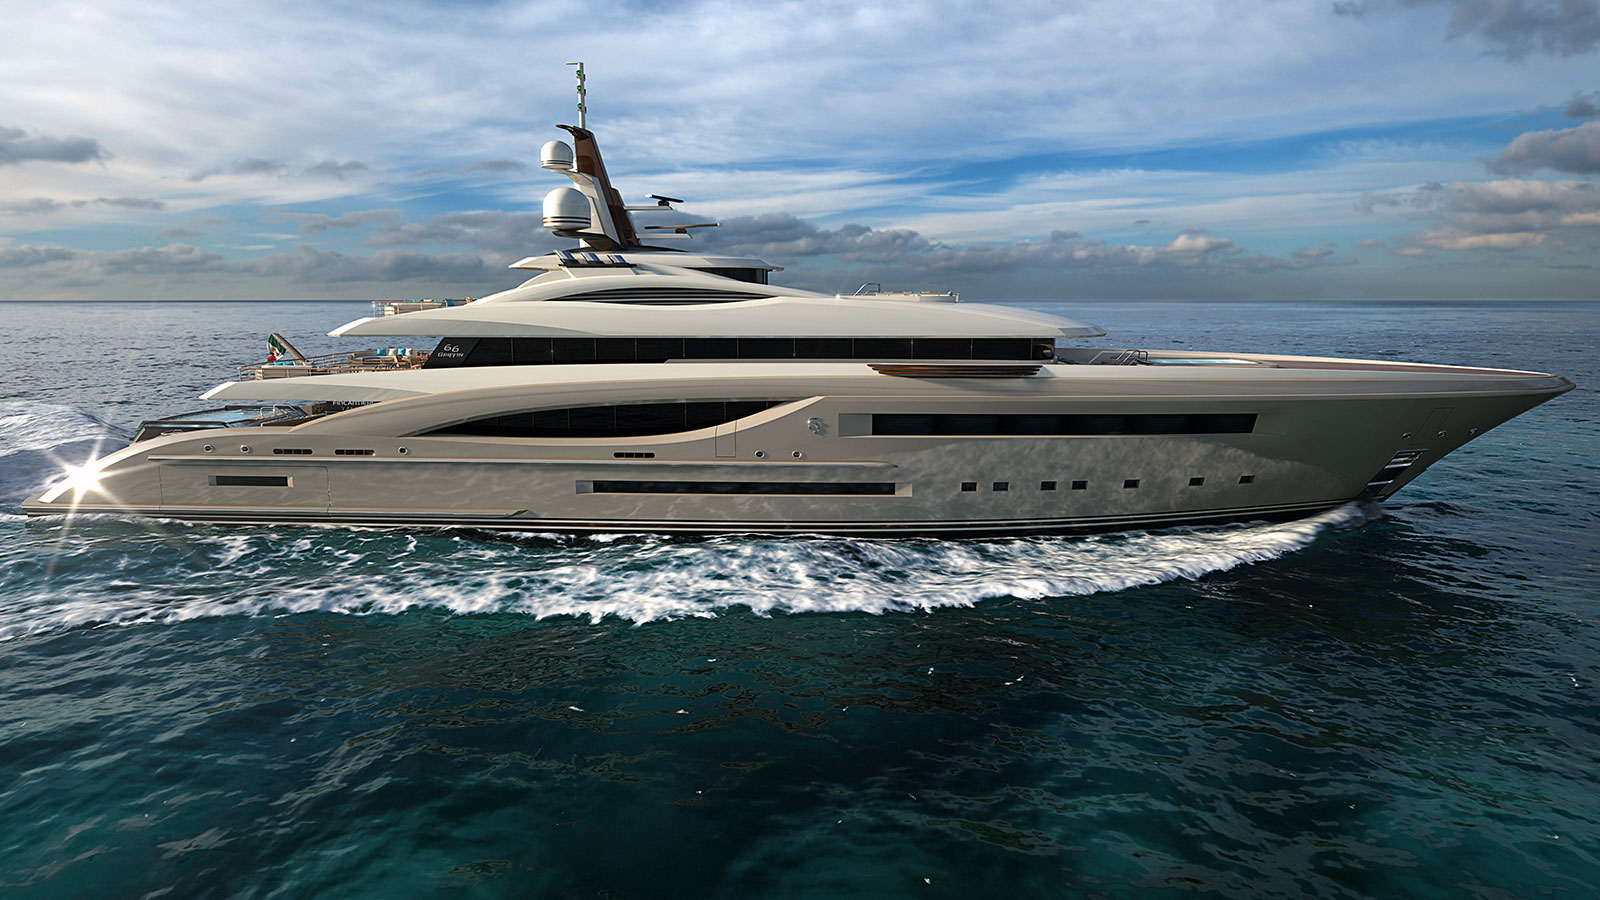 side-view-of-the-fincantieri-superyacht-concept-griffin-66